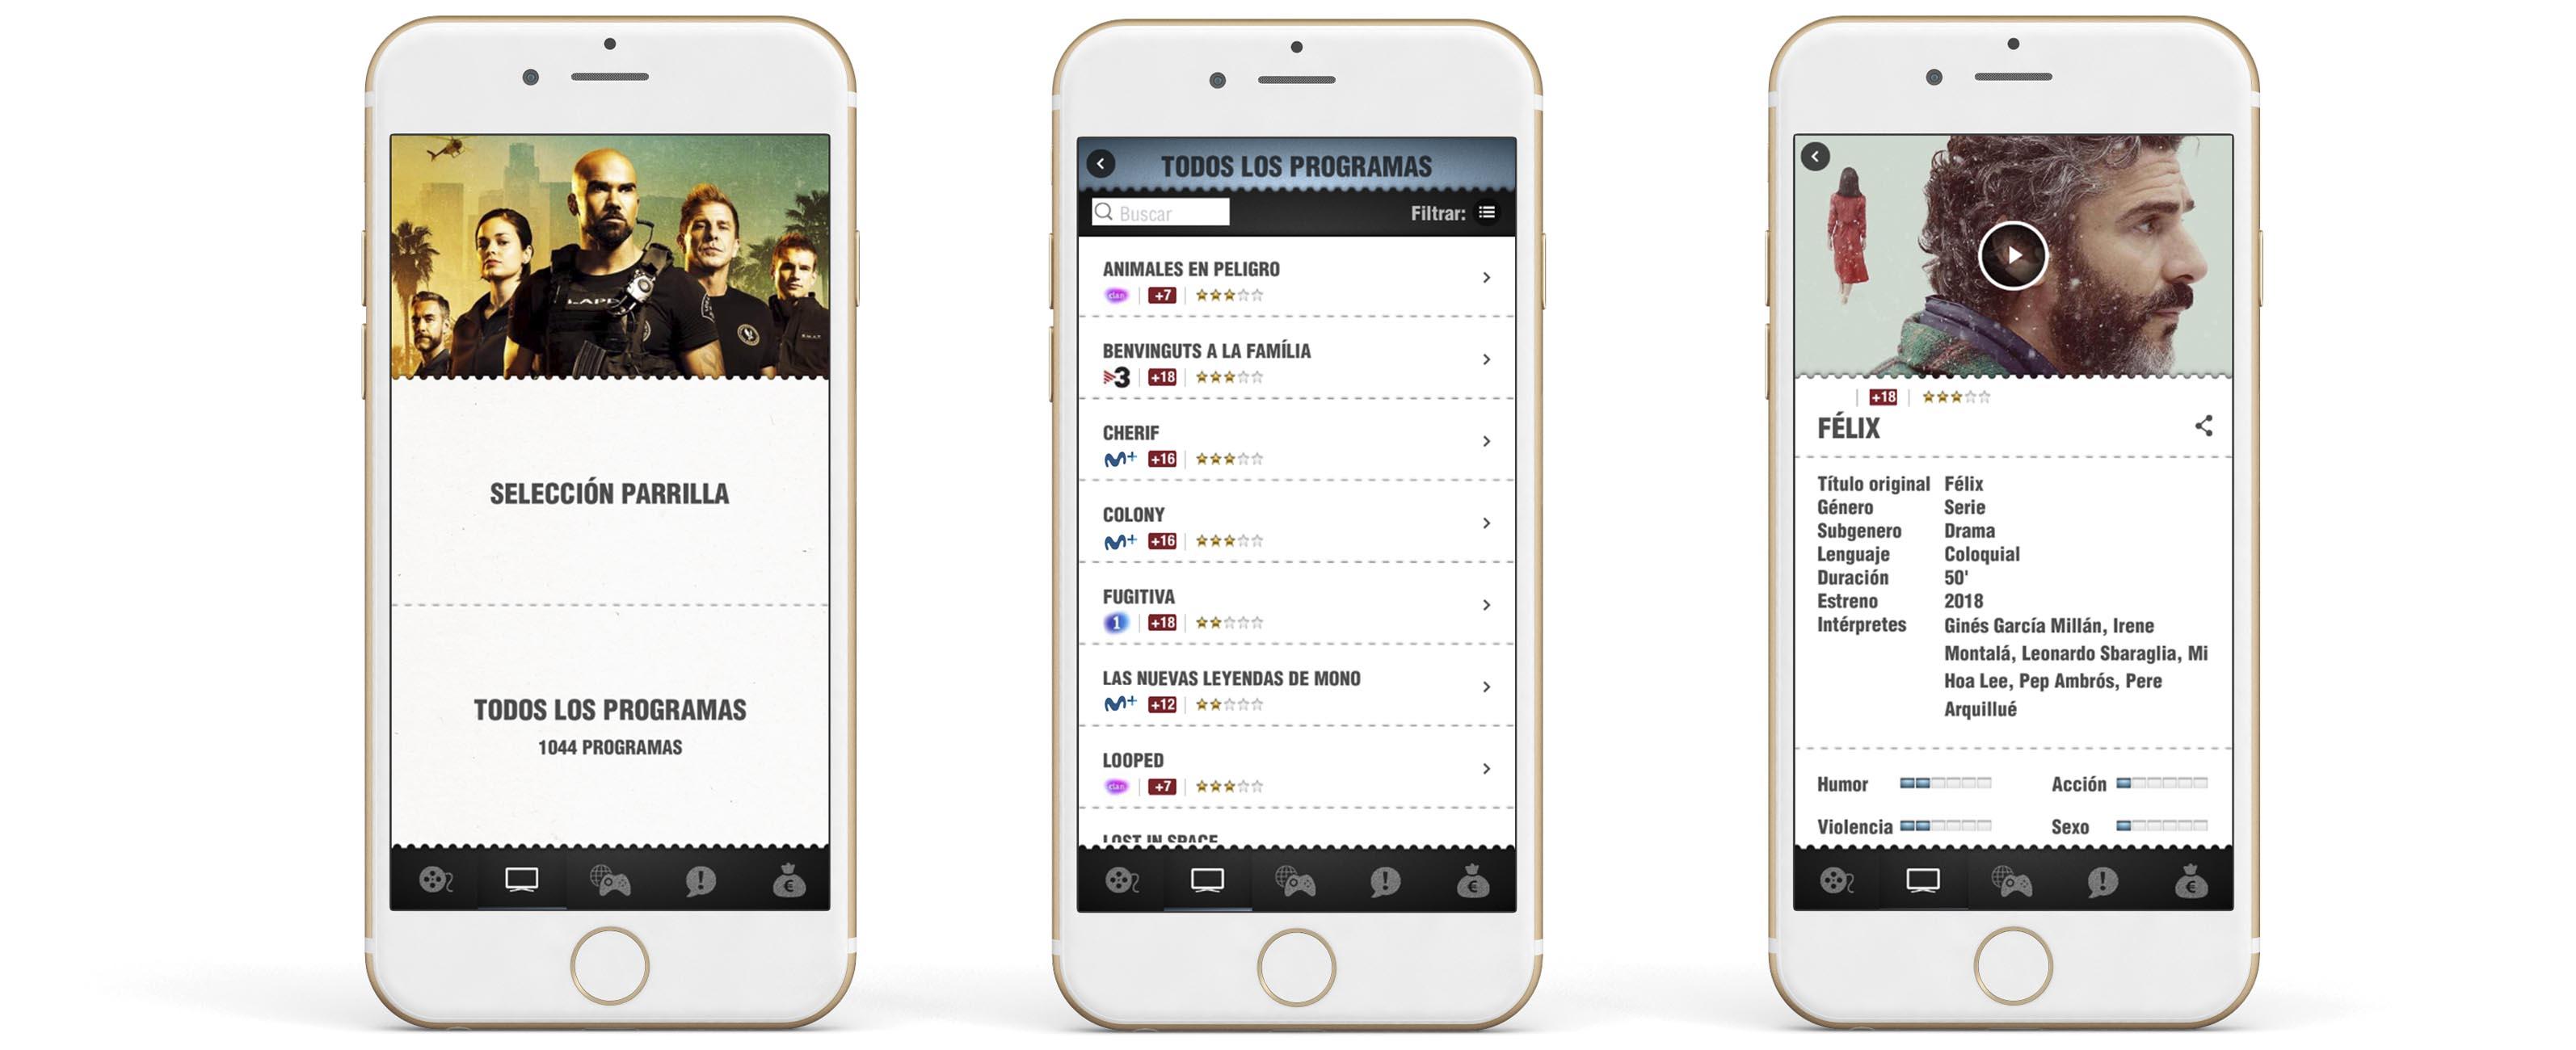 App Criticas TV Contraste